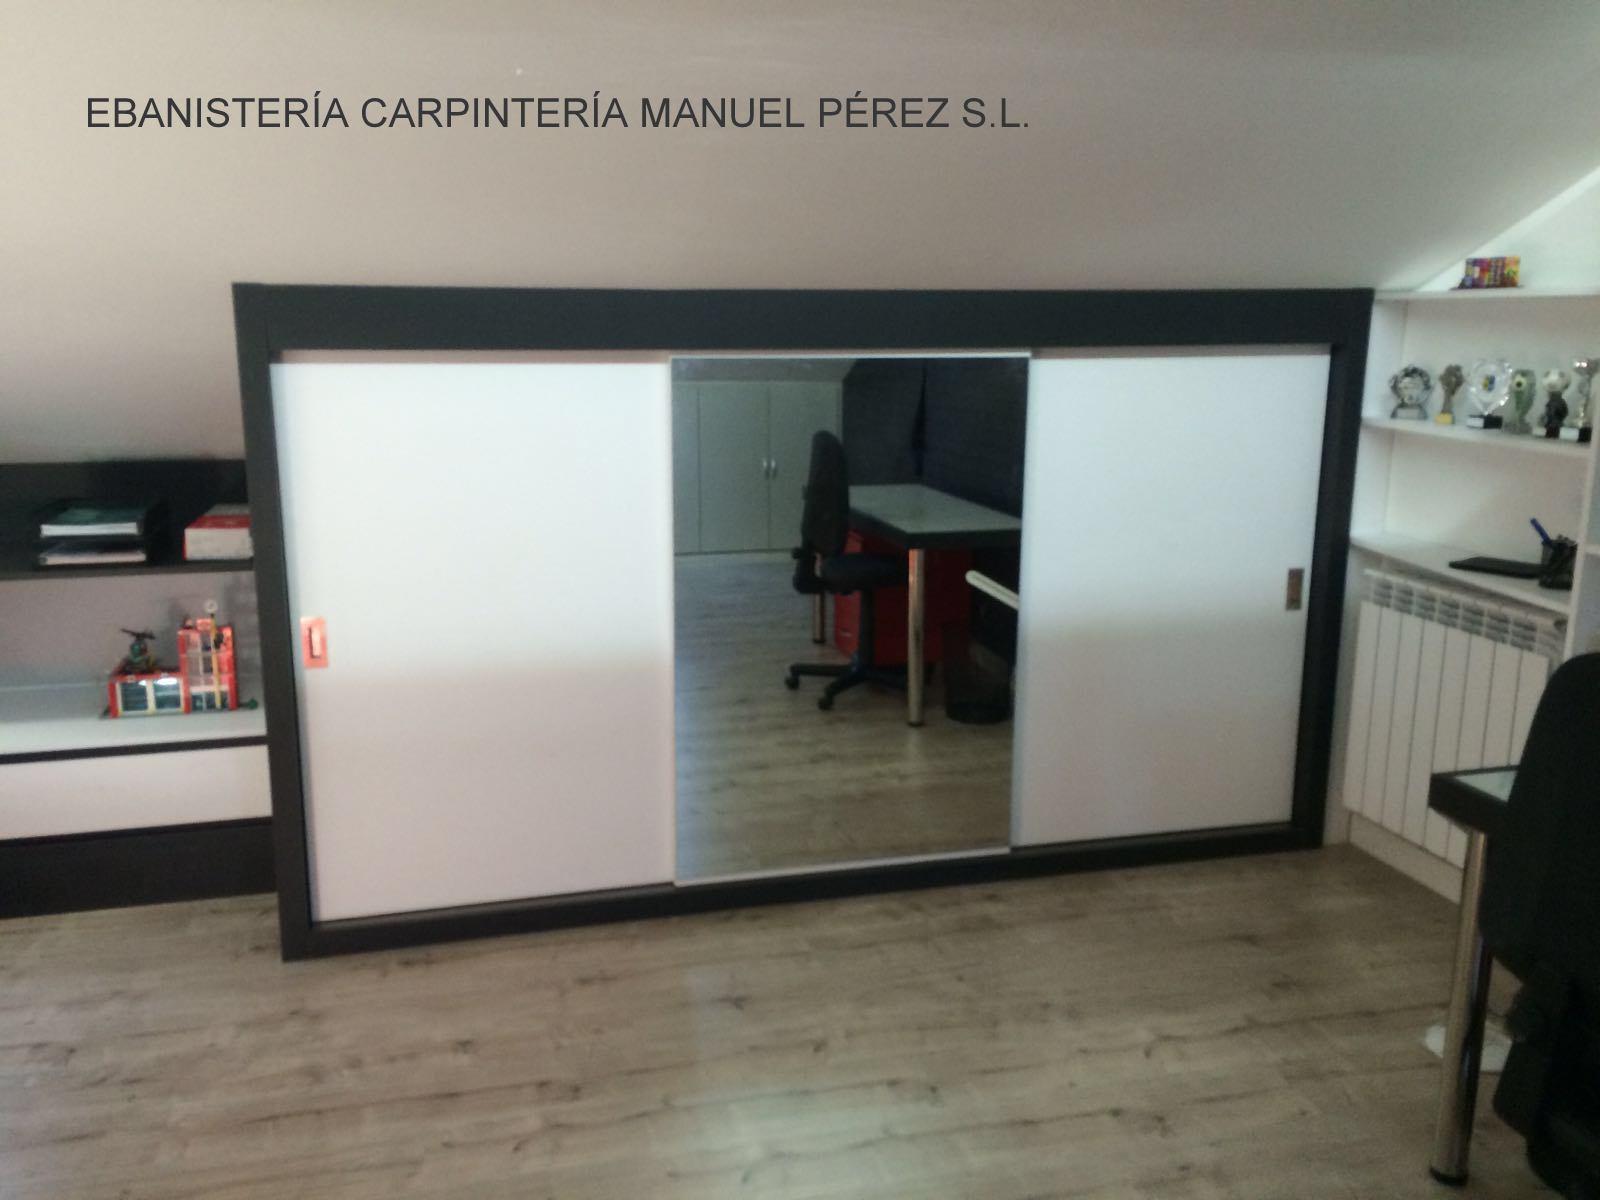 Ebanisteria carpinteria manuel perez zaragoza - Habitacion a medida ...